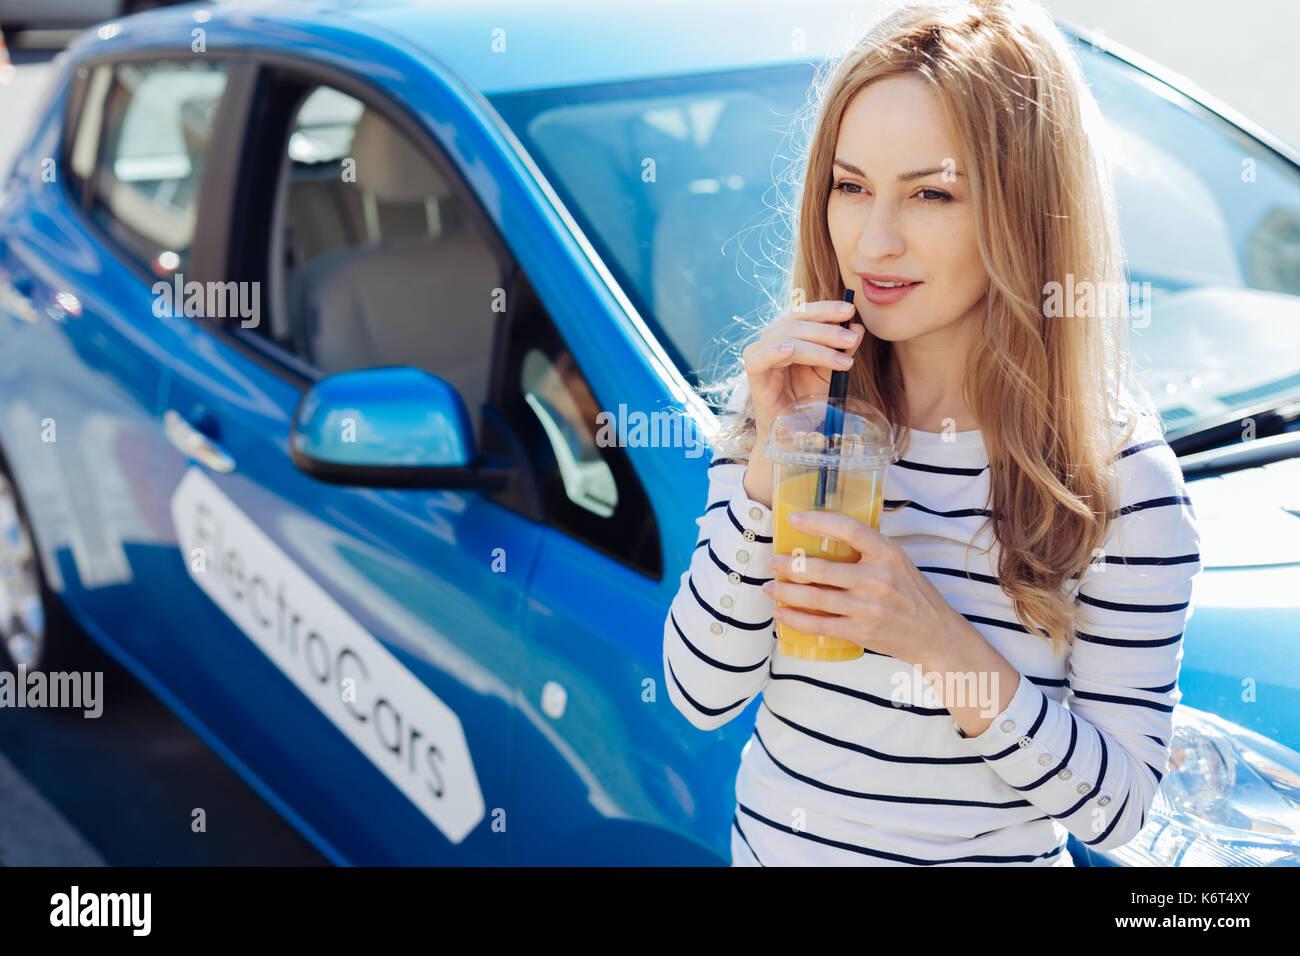 Freudige schöne Frau trinkt Orangensaft Stockbild